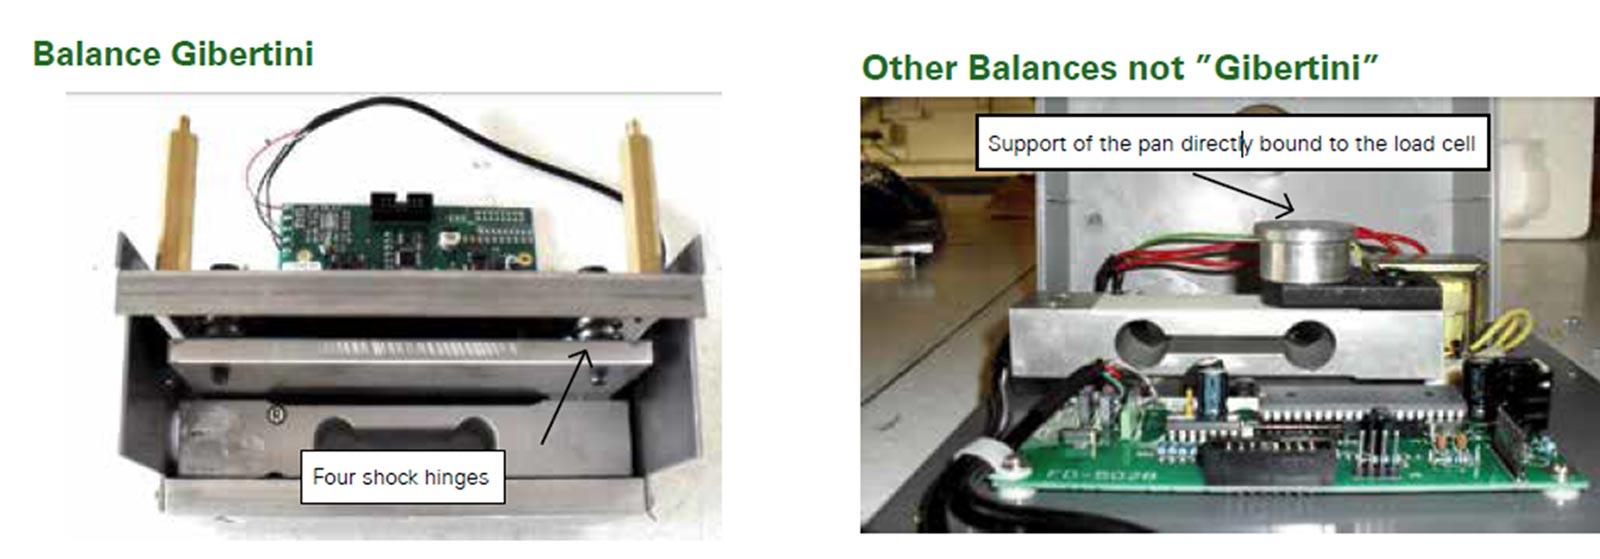 Gilbertie balances